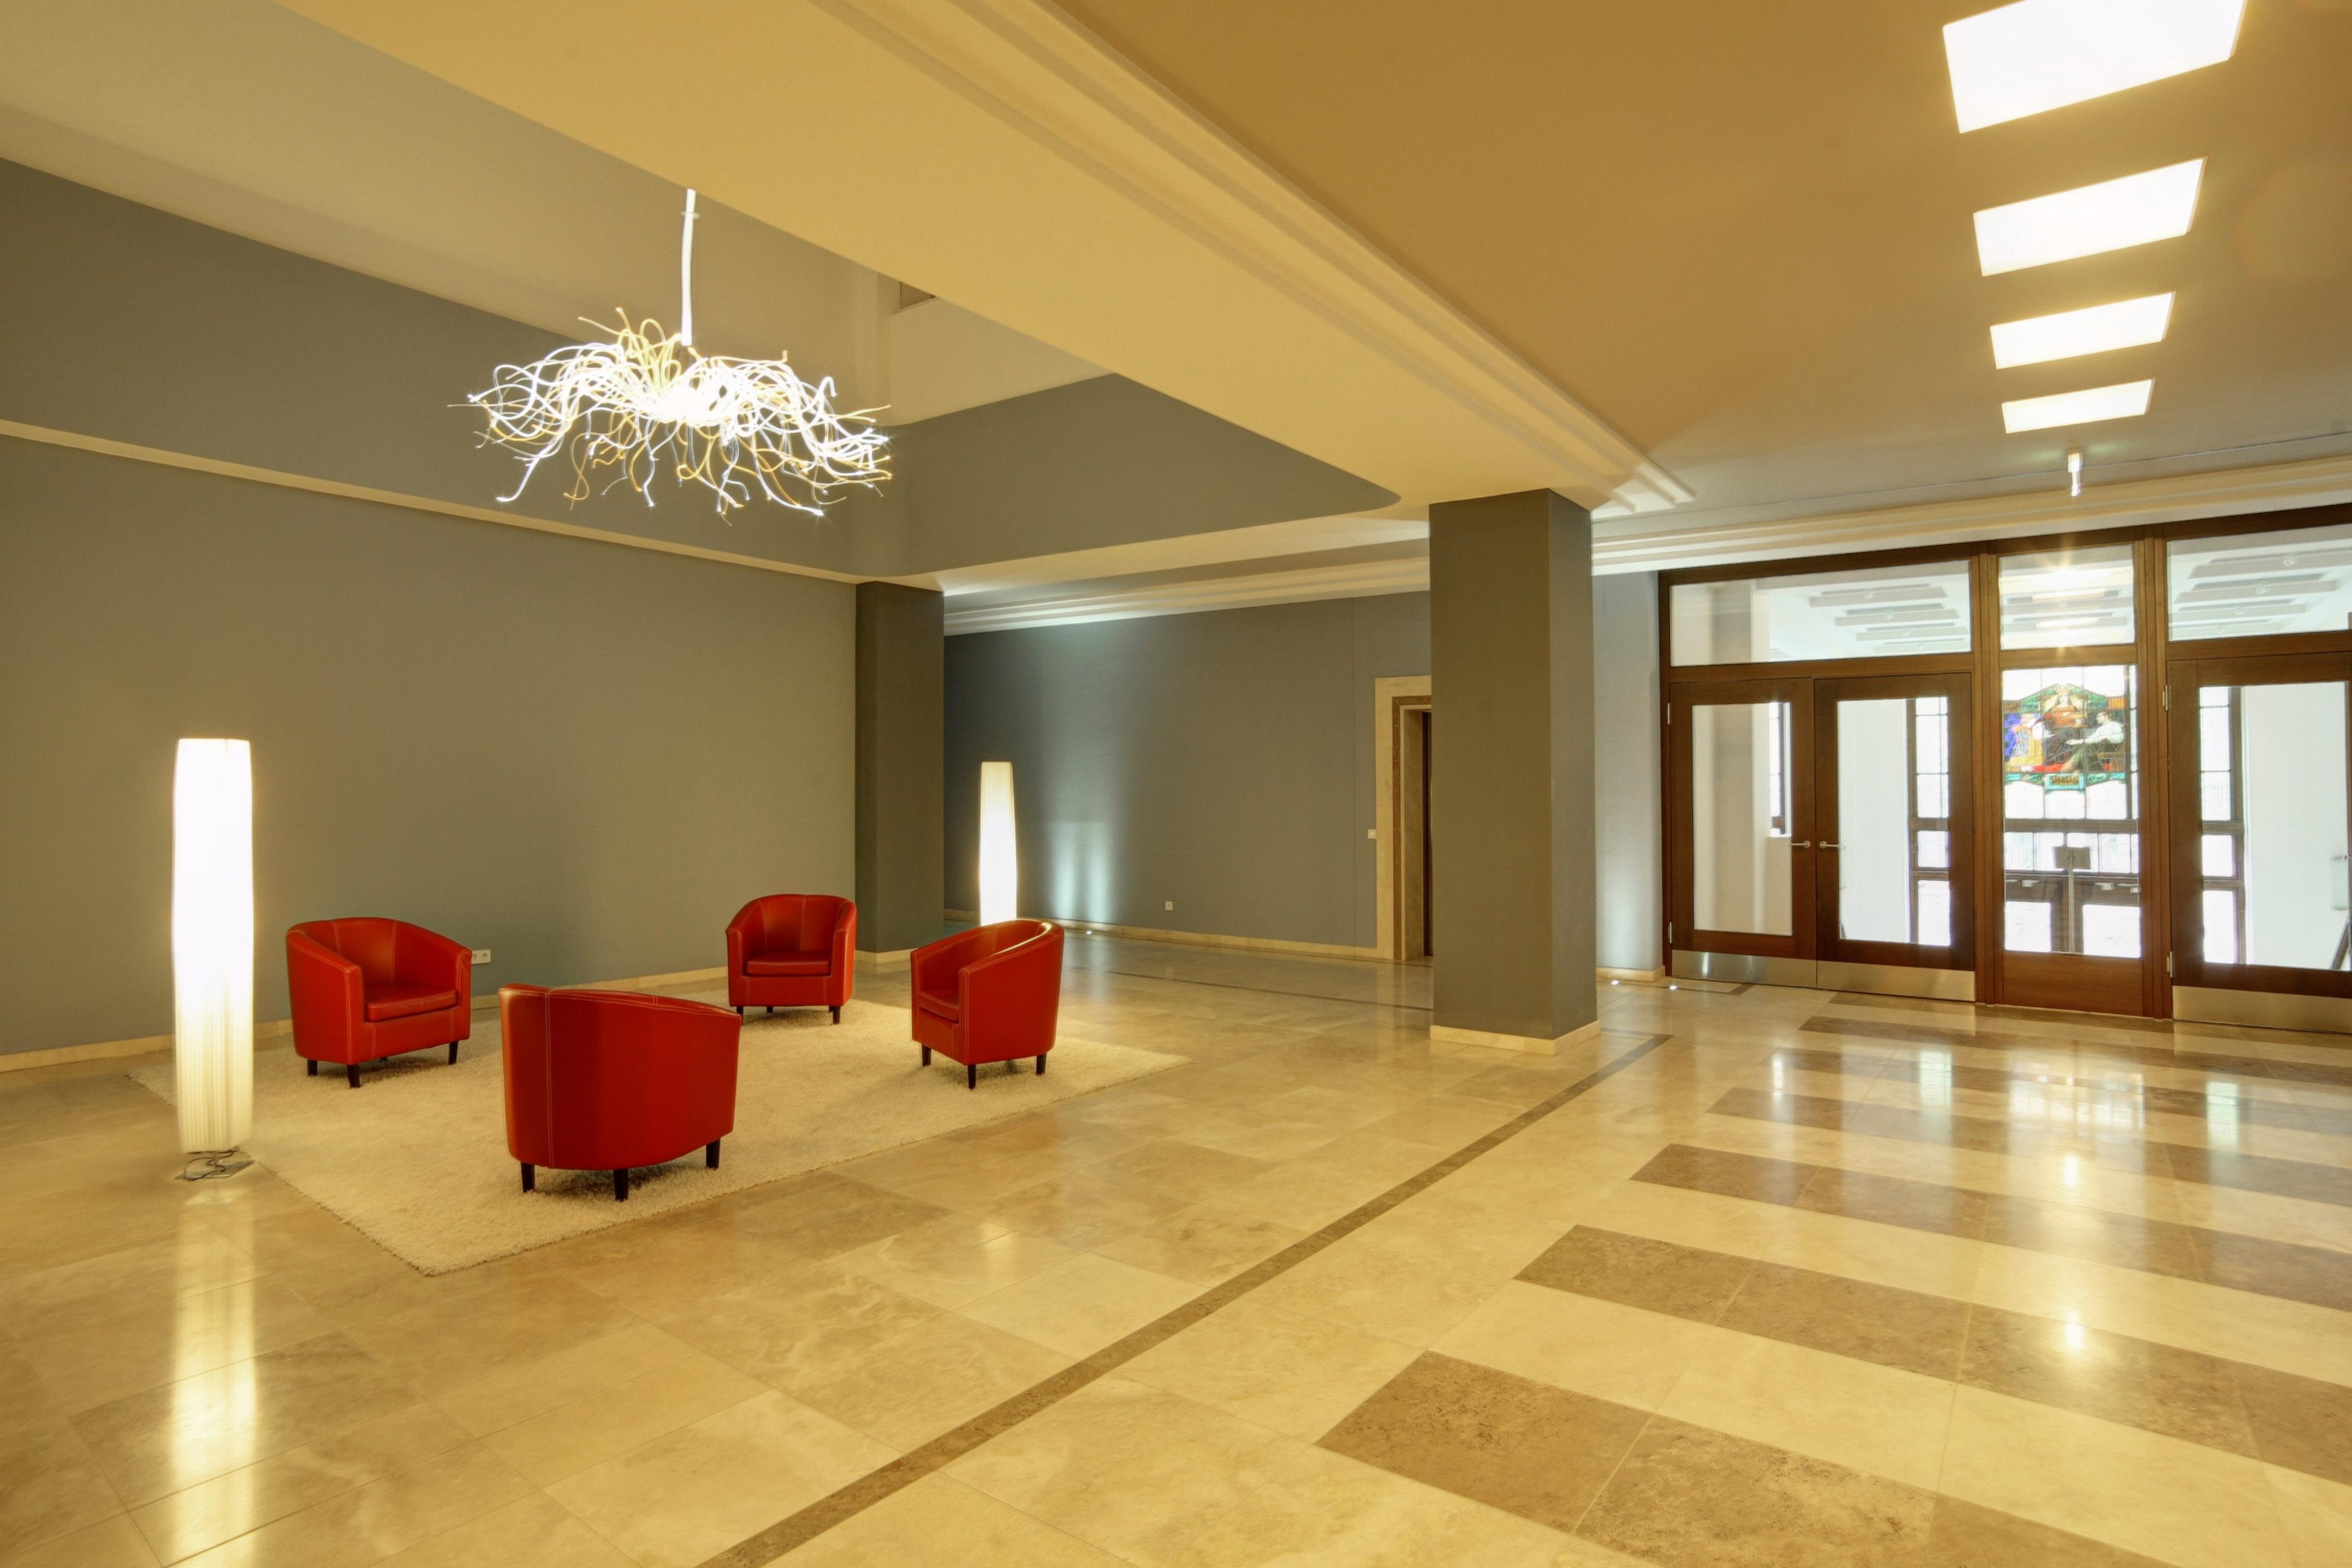 Fotos gratis arquitectura piso edificio casa techo - Diseno de interiores gratis ...